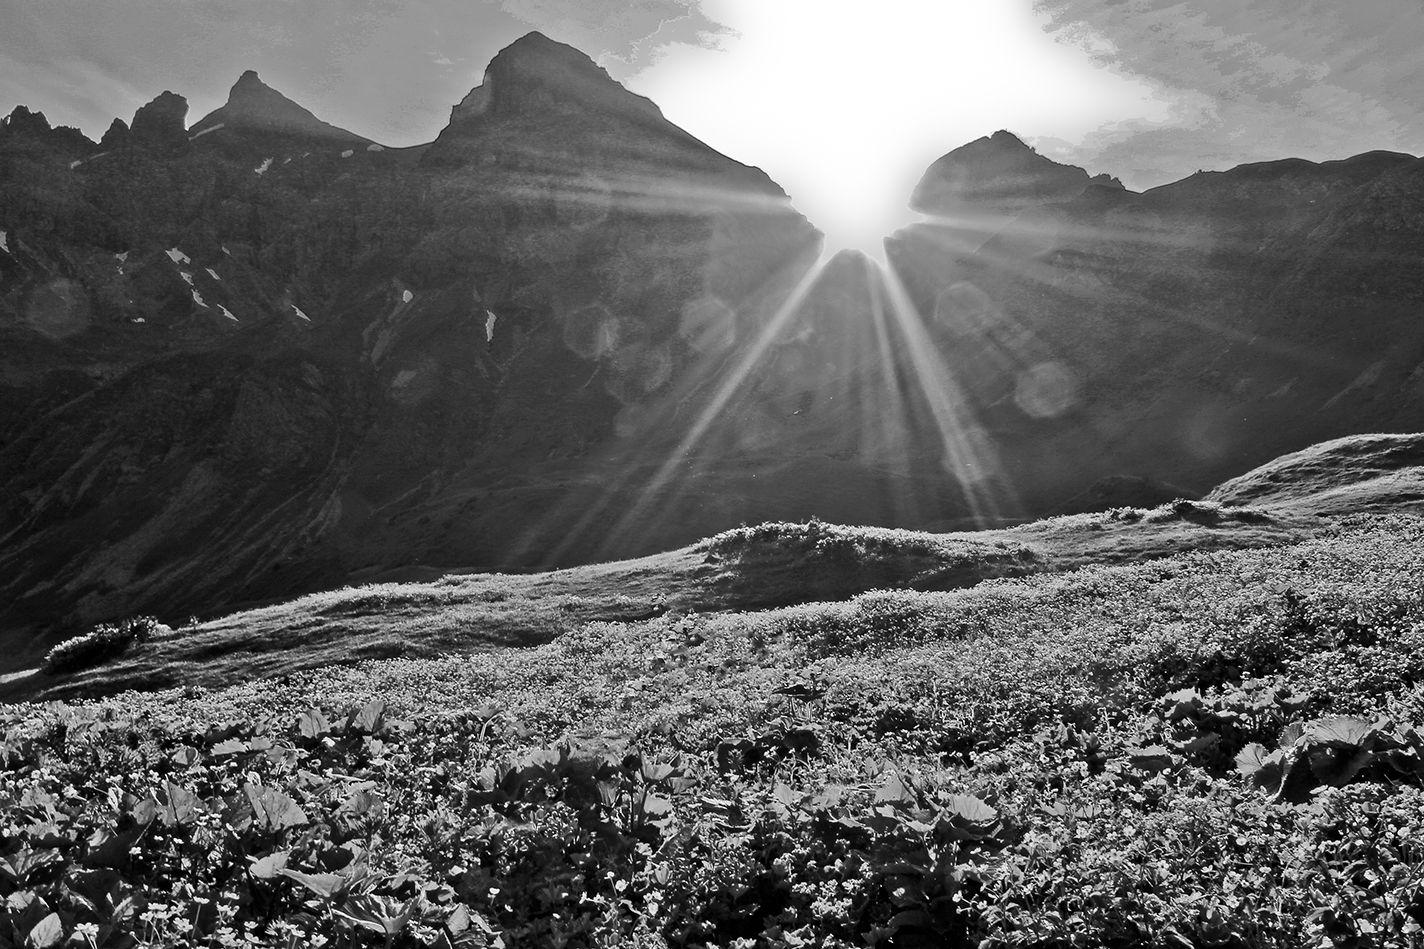 Sonnenaufgang an der Kemtner Hütte im Juli 2013.